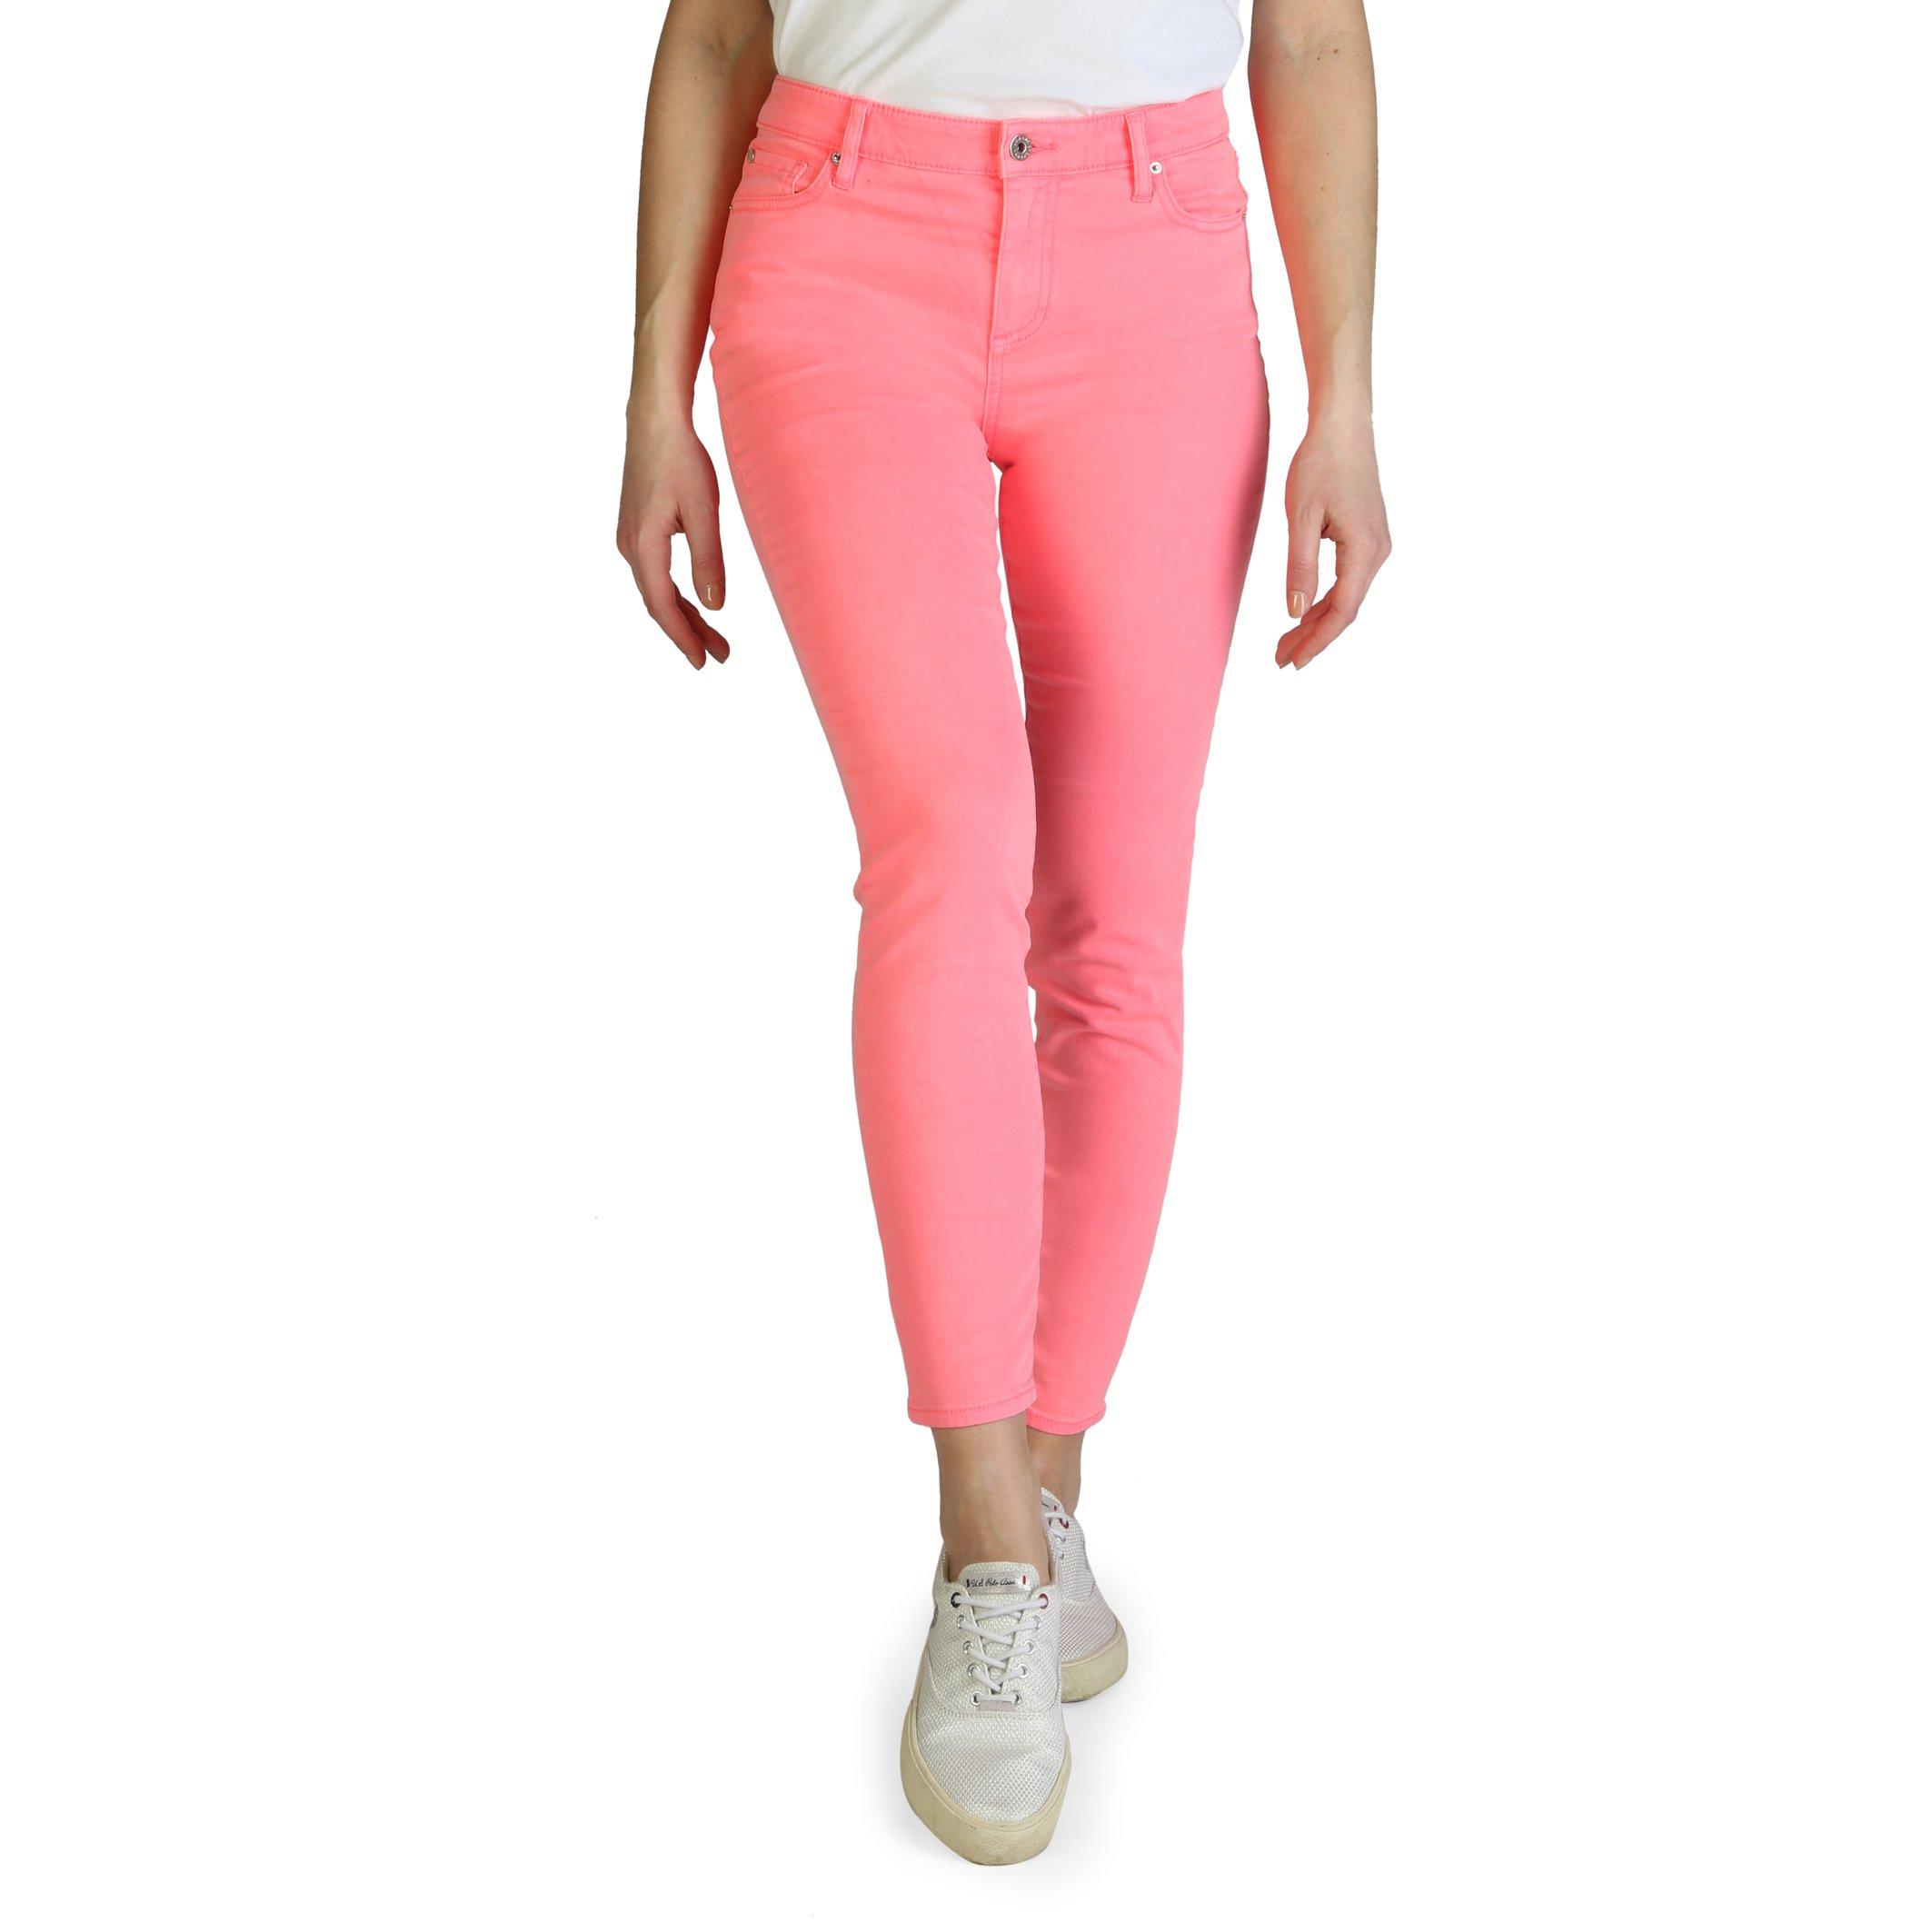 Armani Exchange Women's Jeans Various Colours 331924 - pink 29